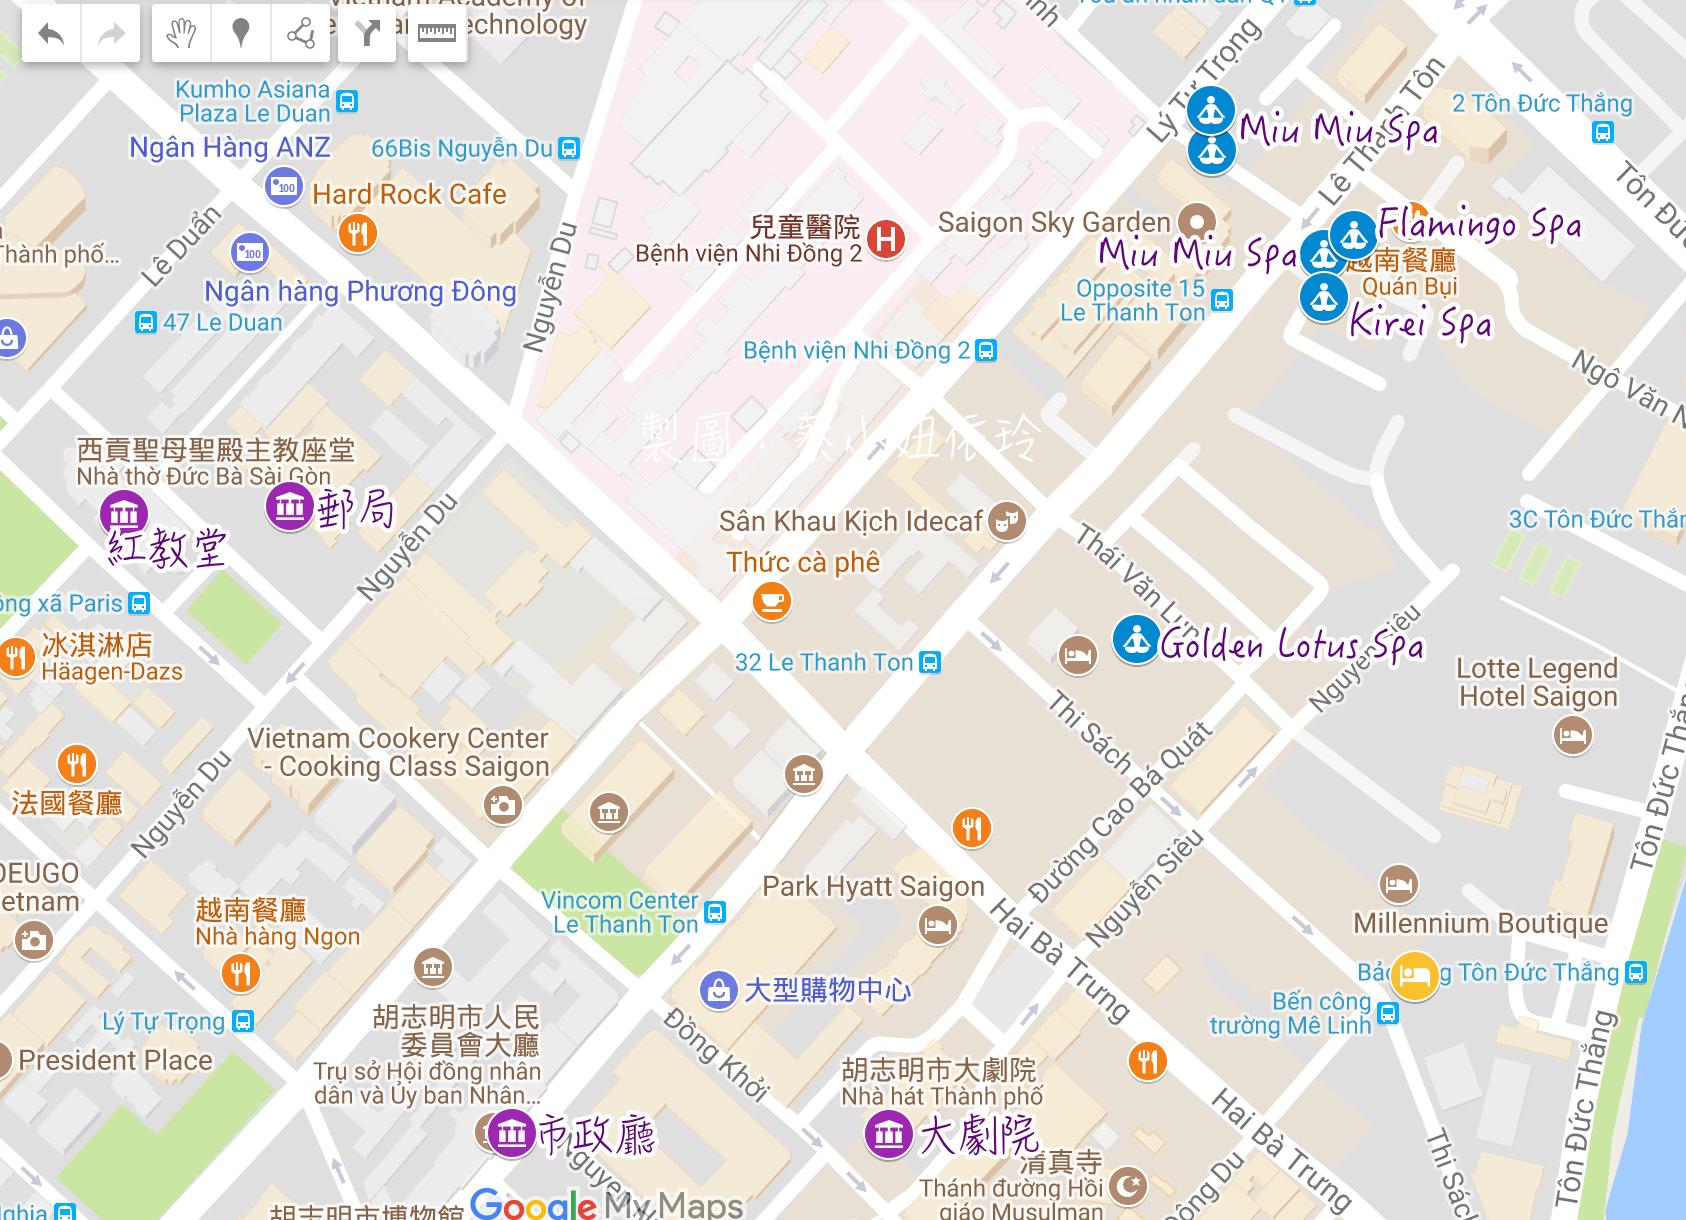 胡志明市Spa推薦 Flamingo Spa Tripadvisor好評按摩店